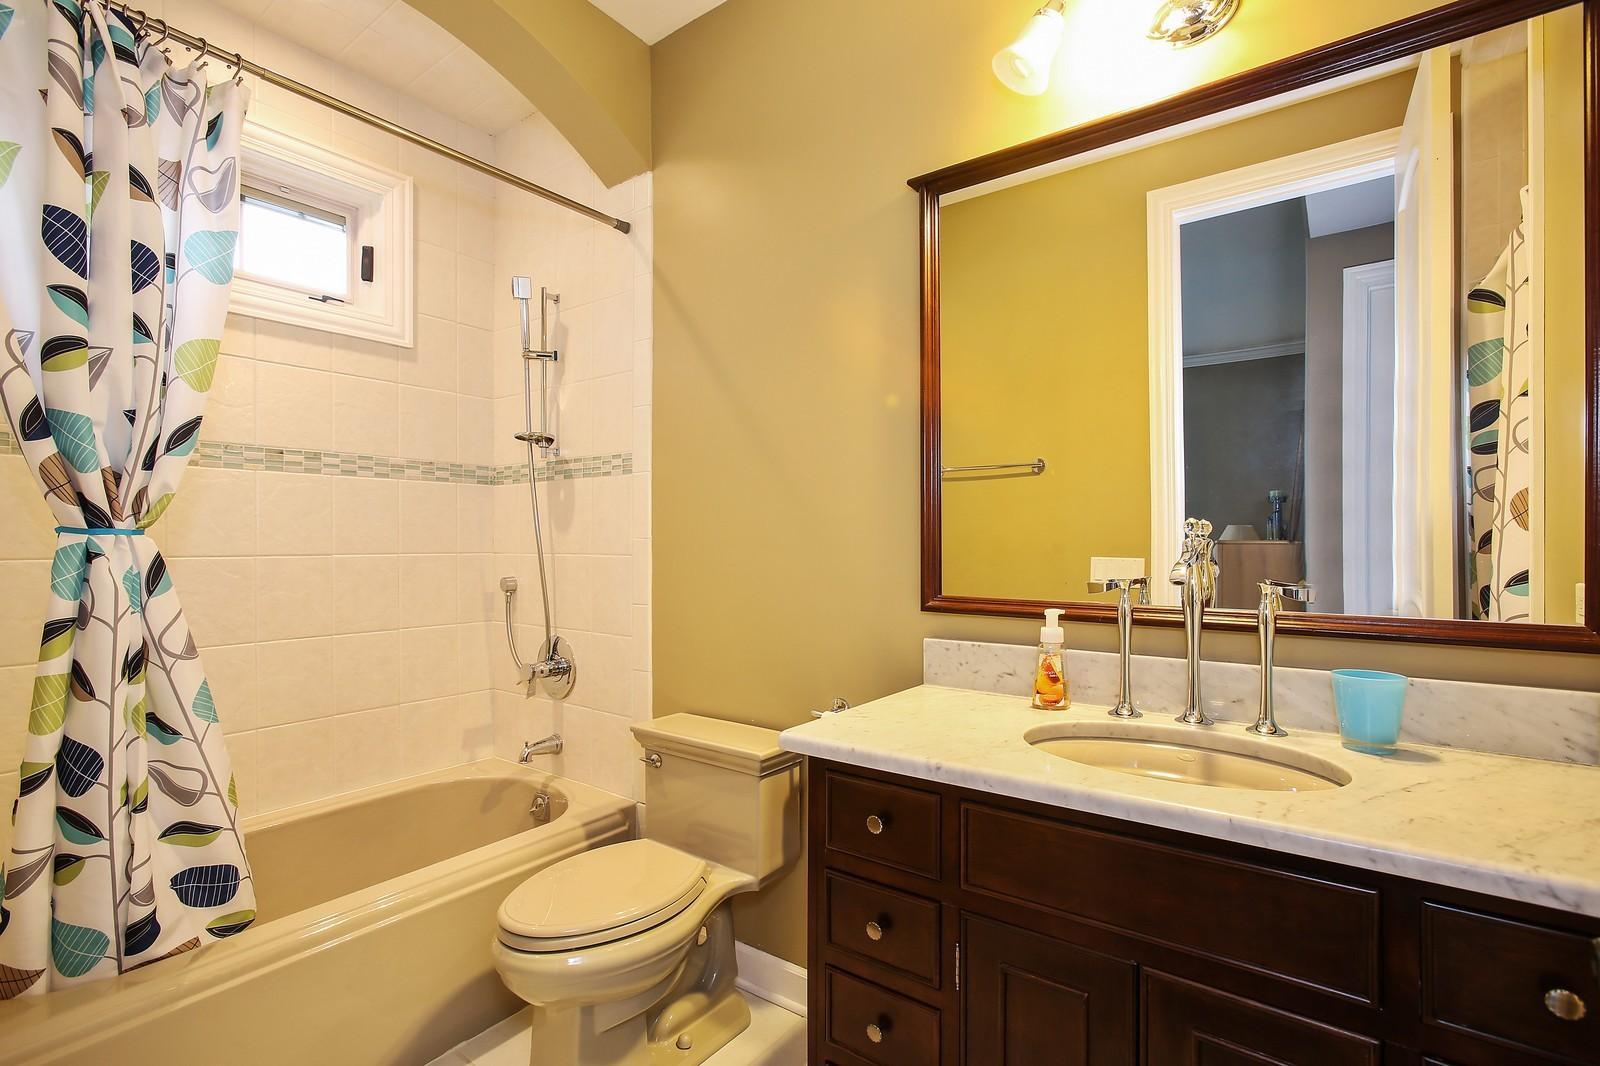 Real Estate Photography - 719 S Hillside Ave, Elmhurst, IL, 60126 - Bathroom